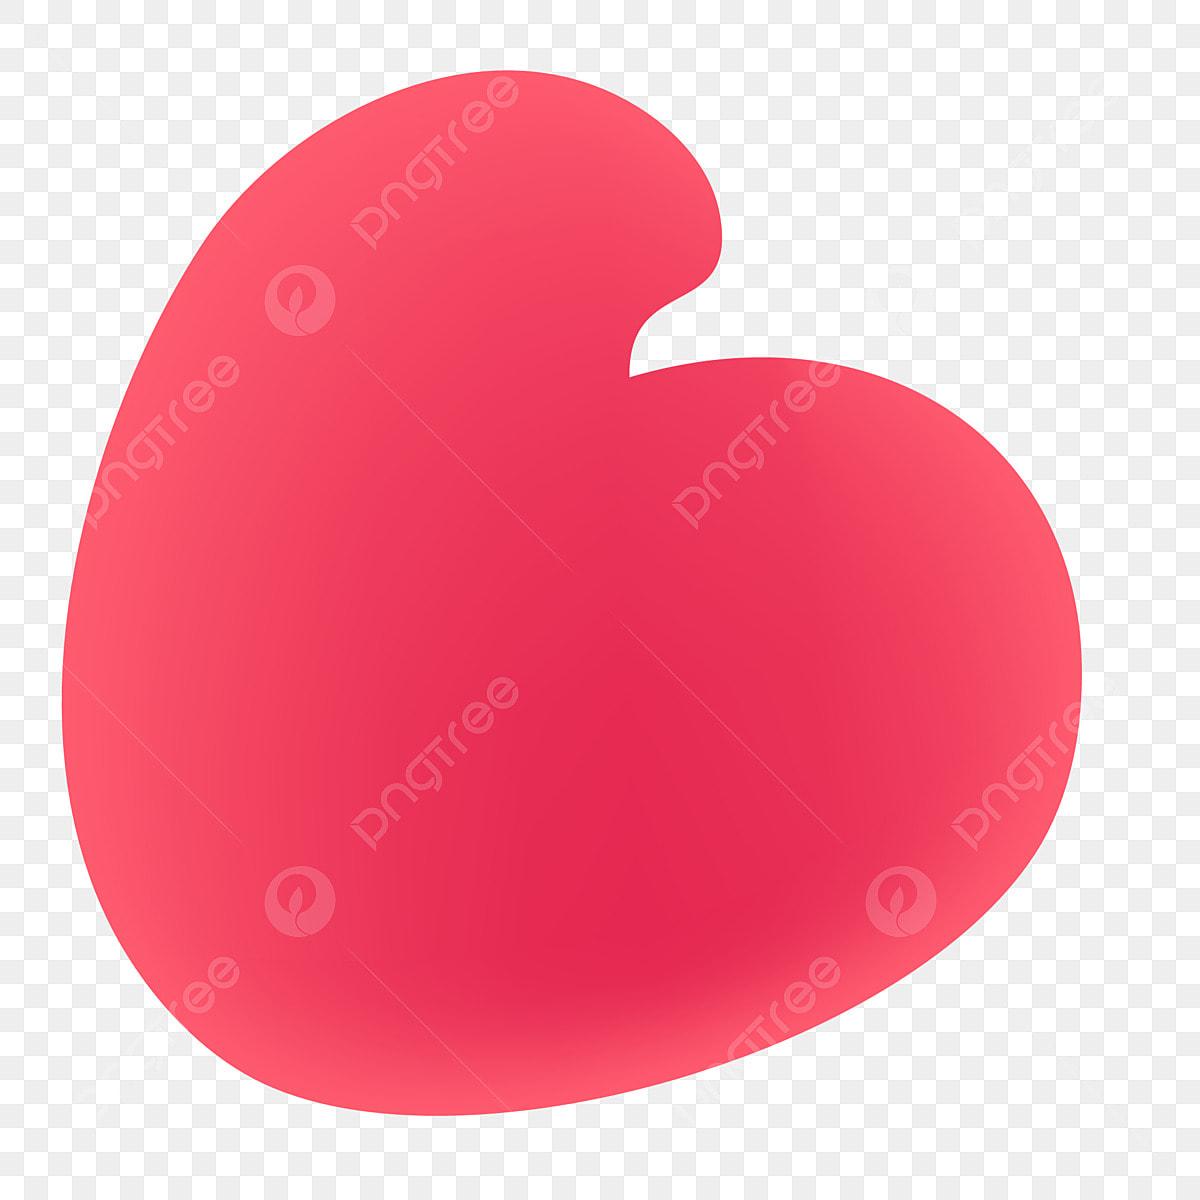 Coeurs Rouges Decoration Amour Dessin Anime Dessin Anime Amour